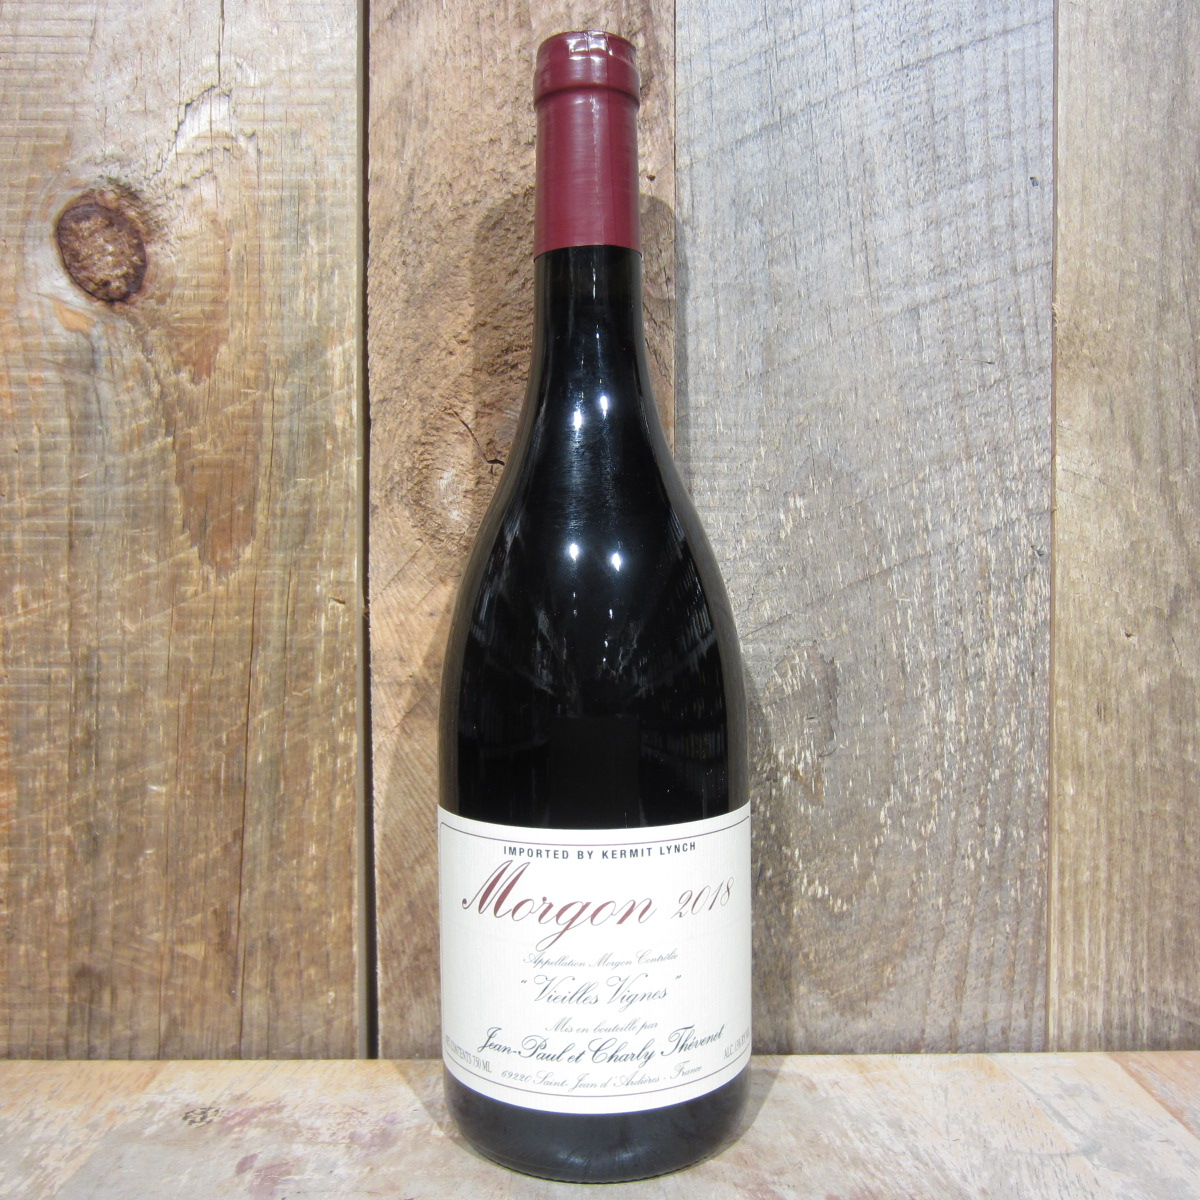 Jean Paul Thevenet Morgon Vieilles Vignes 2019 750ml